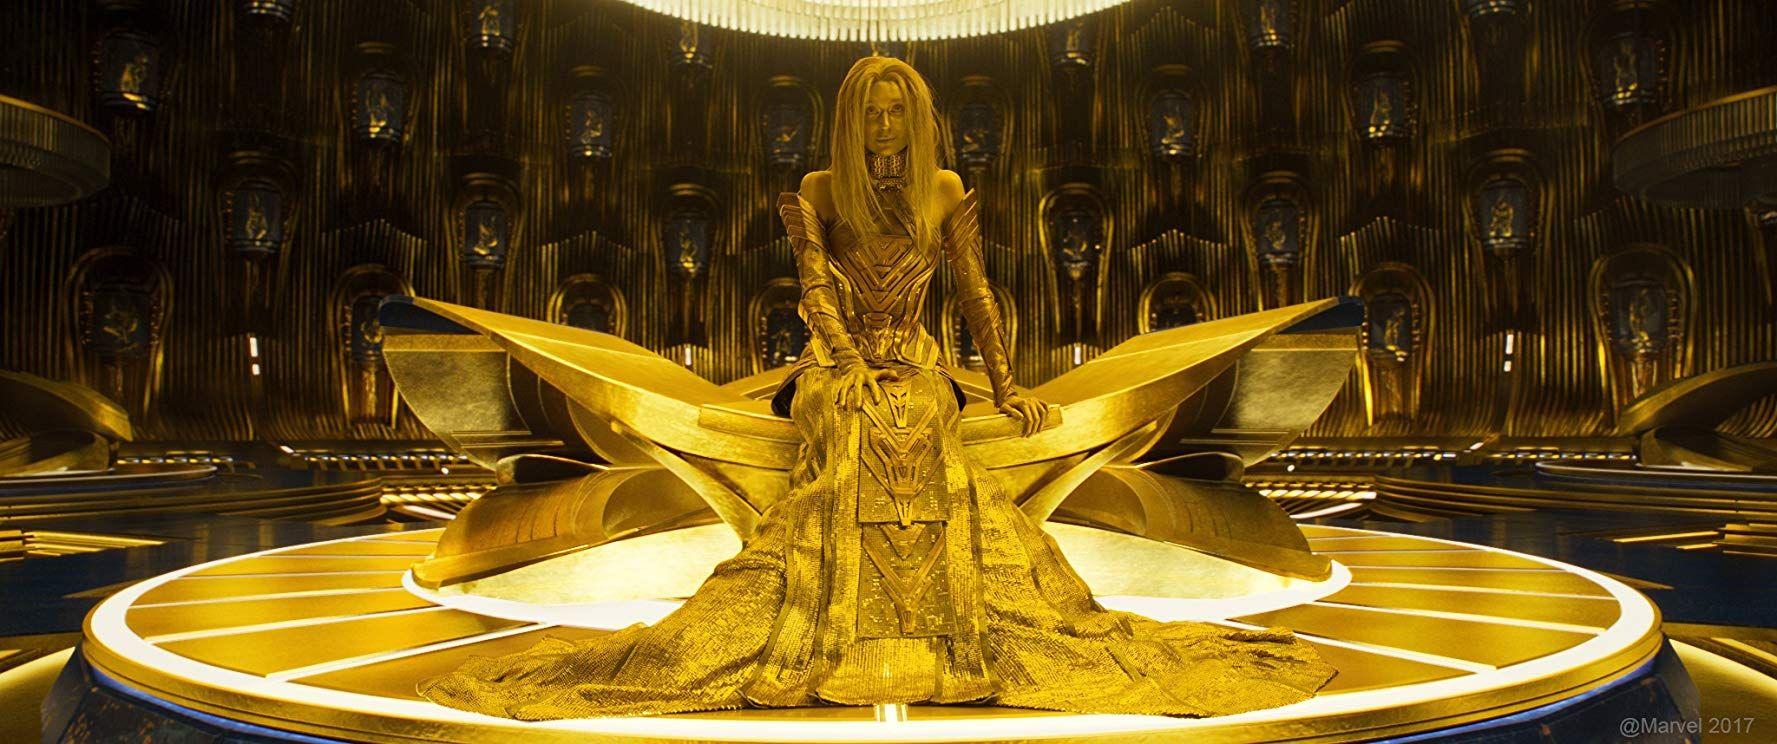 Elizabeth Debicki In Guardians Of The Galaxy Vol 2 2017 Guardians Of The Galaxy Guardians Of The Galaxy Vol 2 Galaxy